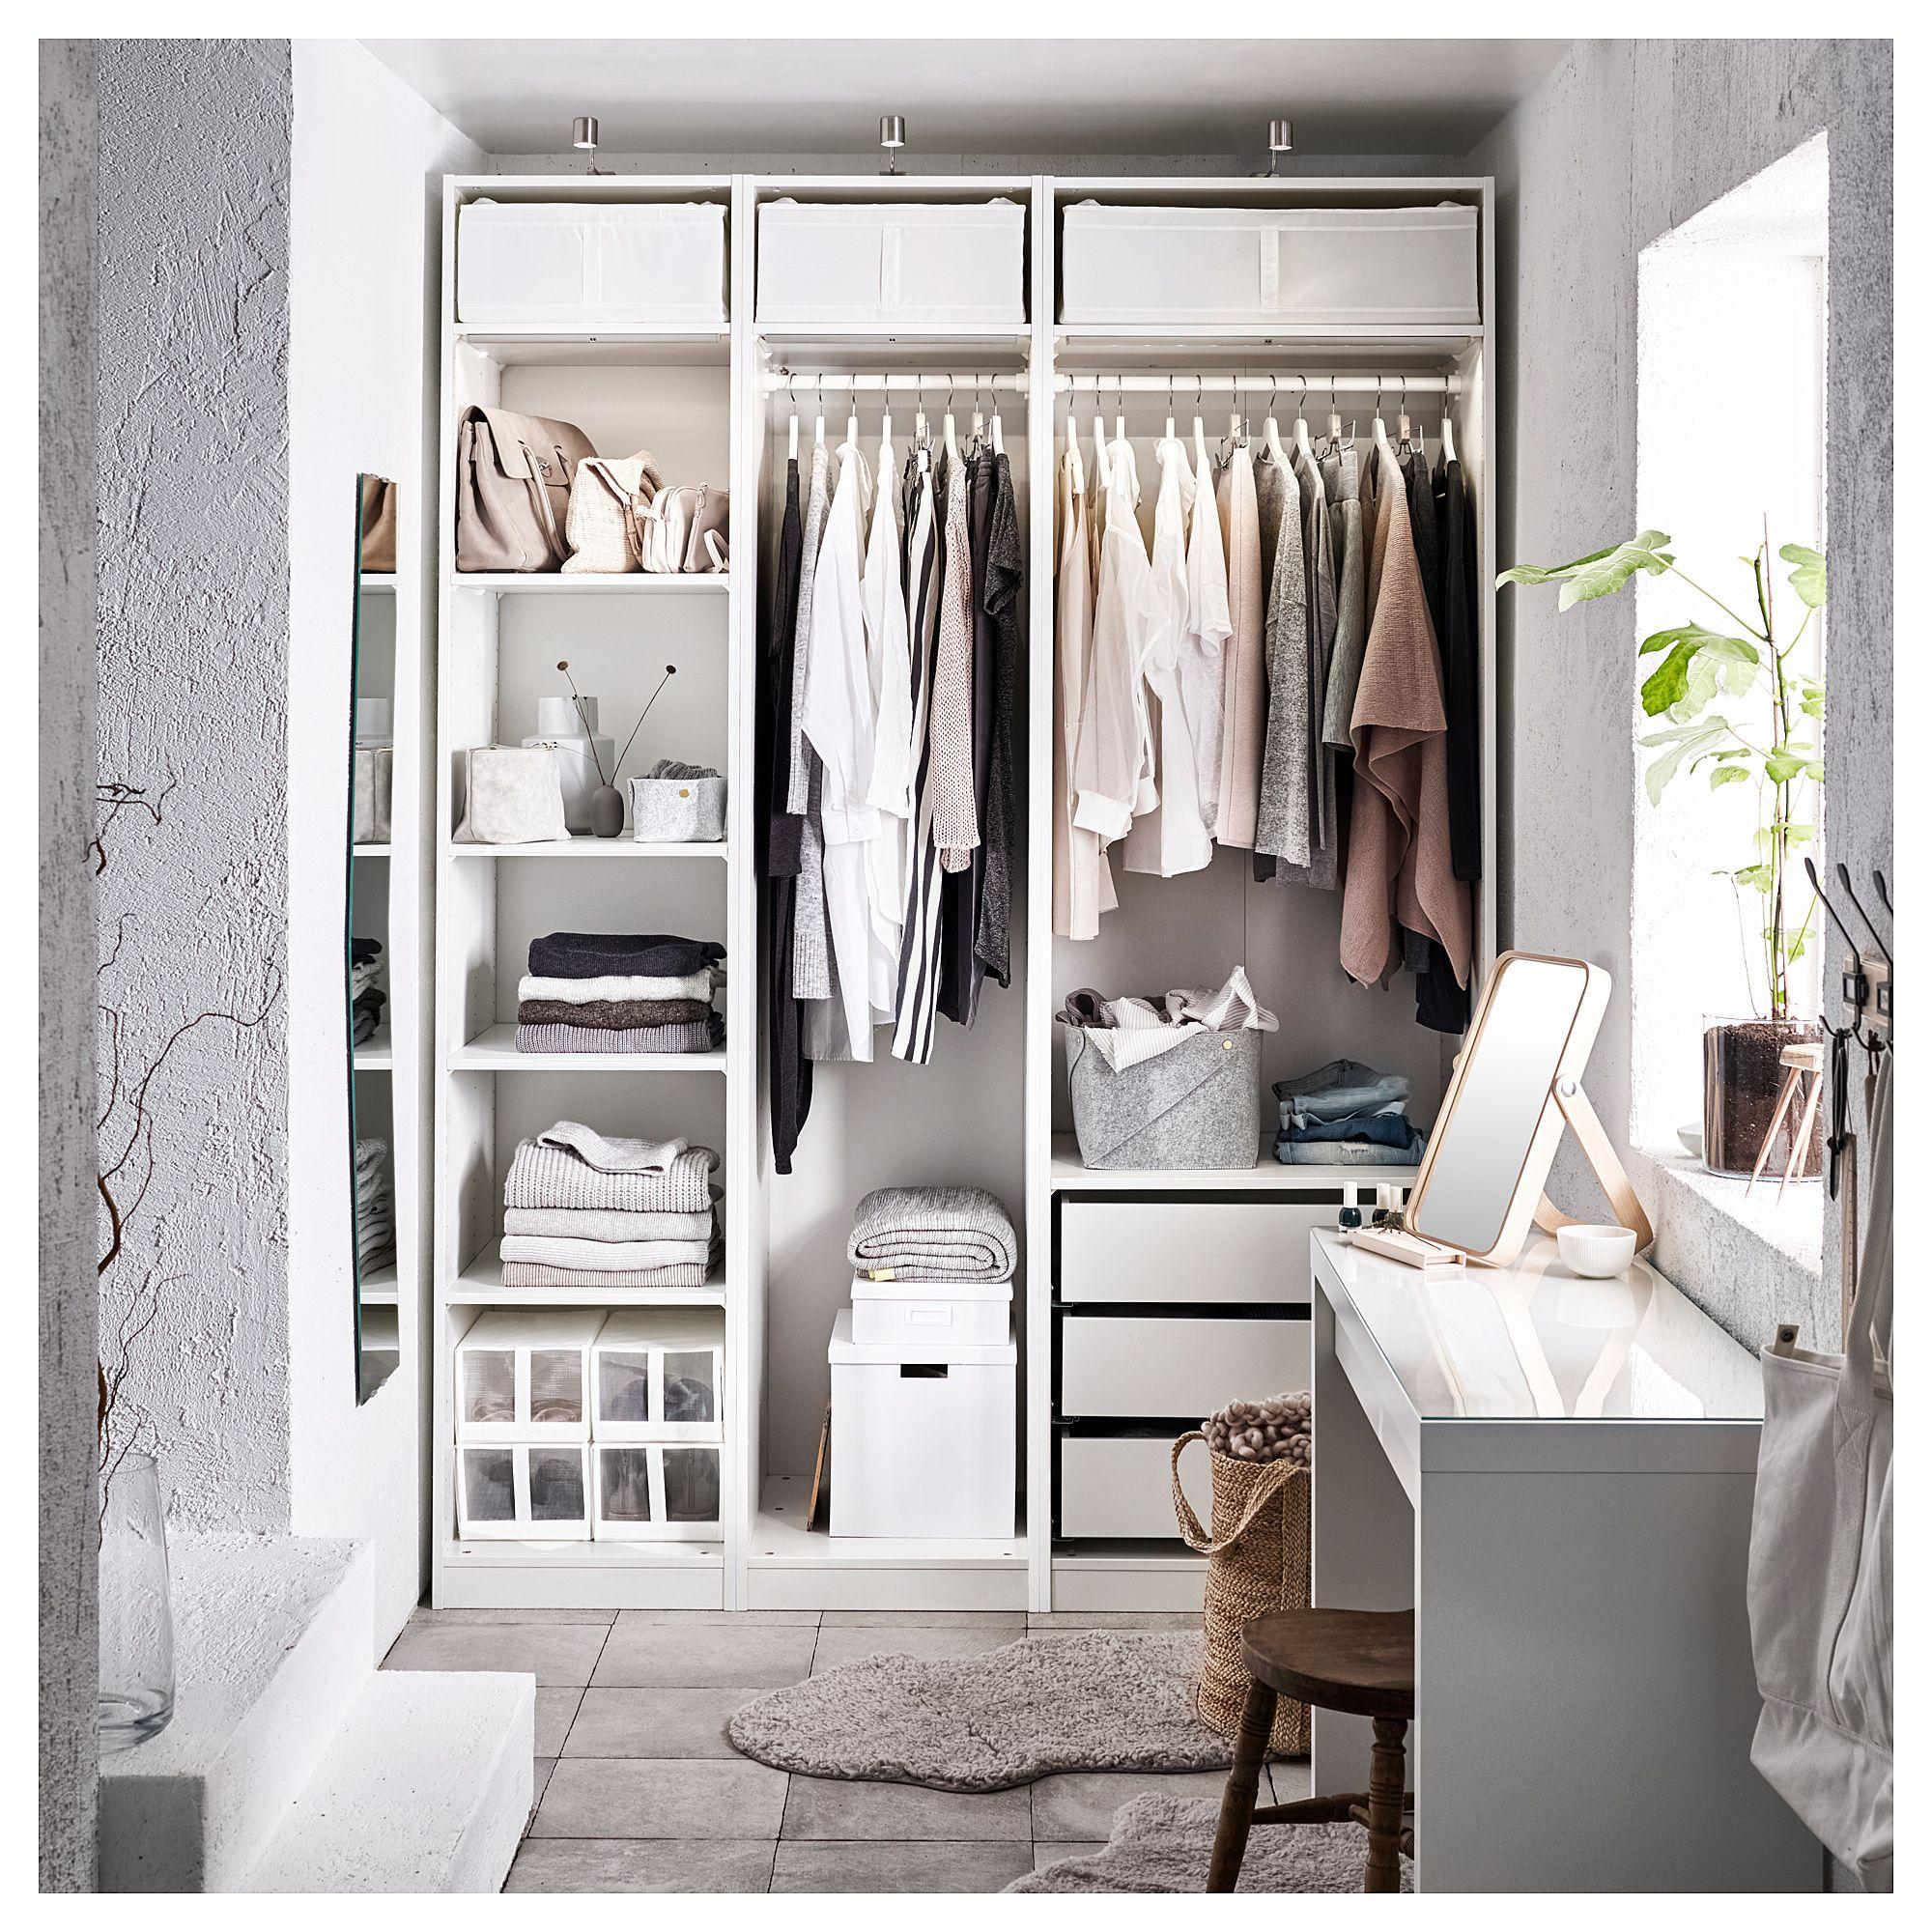 Ikea Pax Wardrobe White In 2019 Ikea Closet Closet